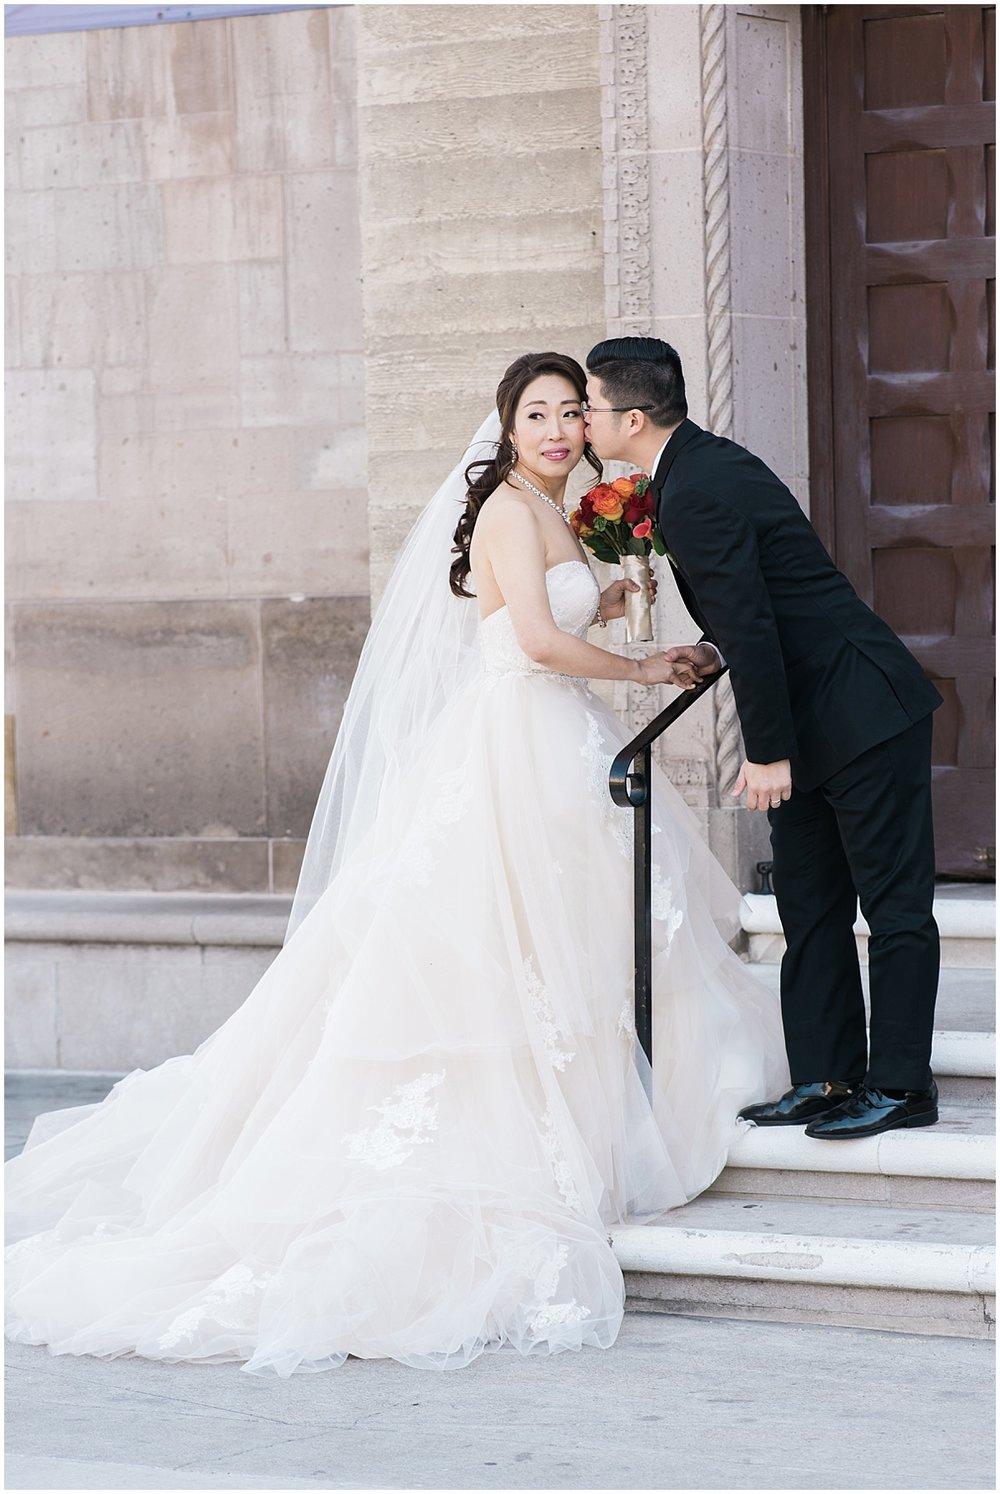 Faith-and-Flower-Wedding-Soo-Dan-Carissa-Woo-Photography_0021.jpg